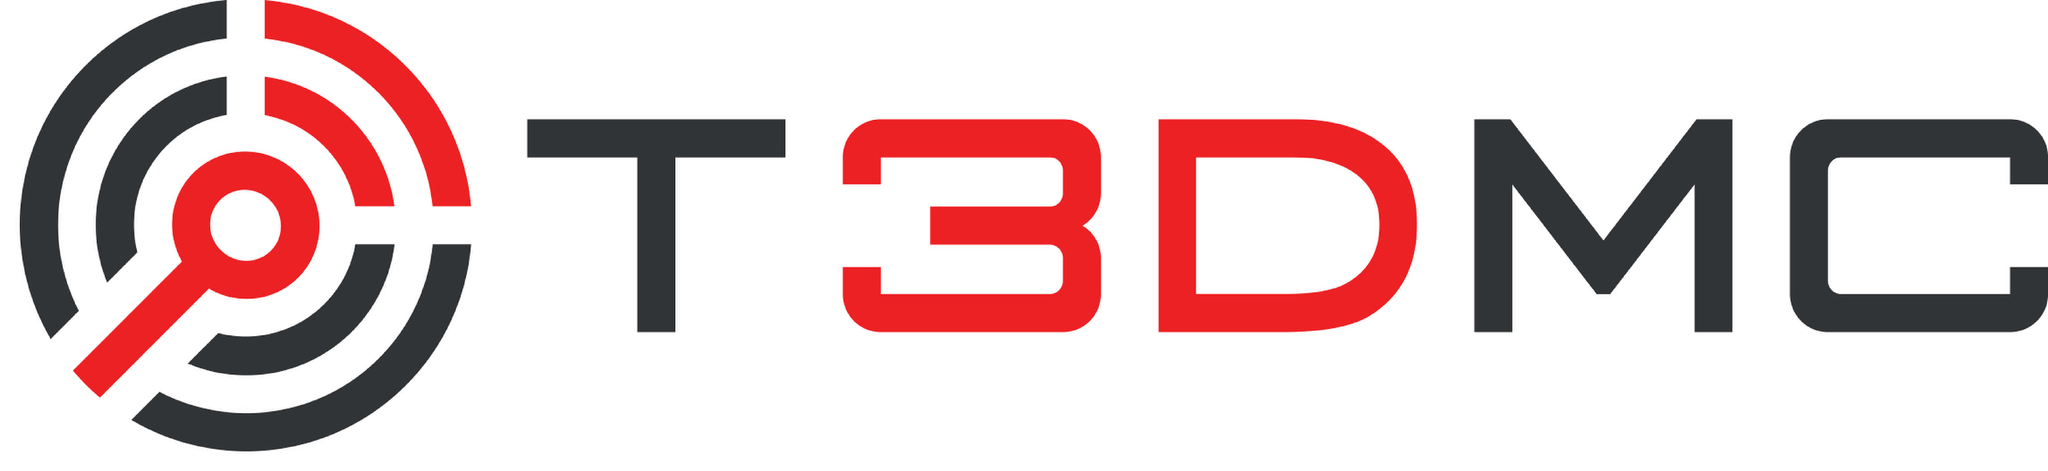 THE 3D MEASUREMENT COMPANY LTD